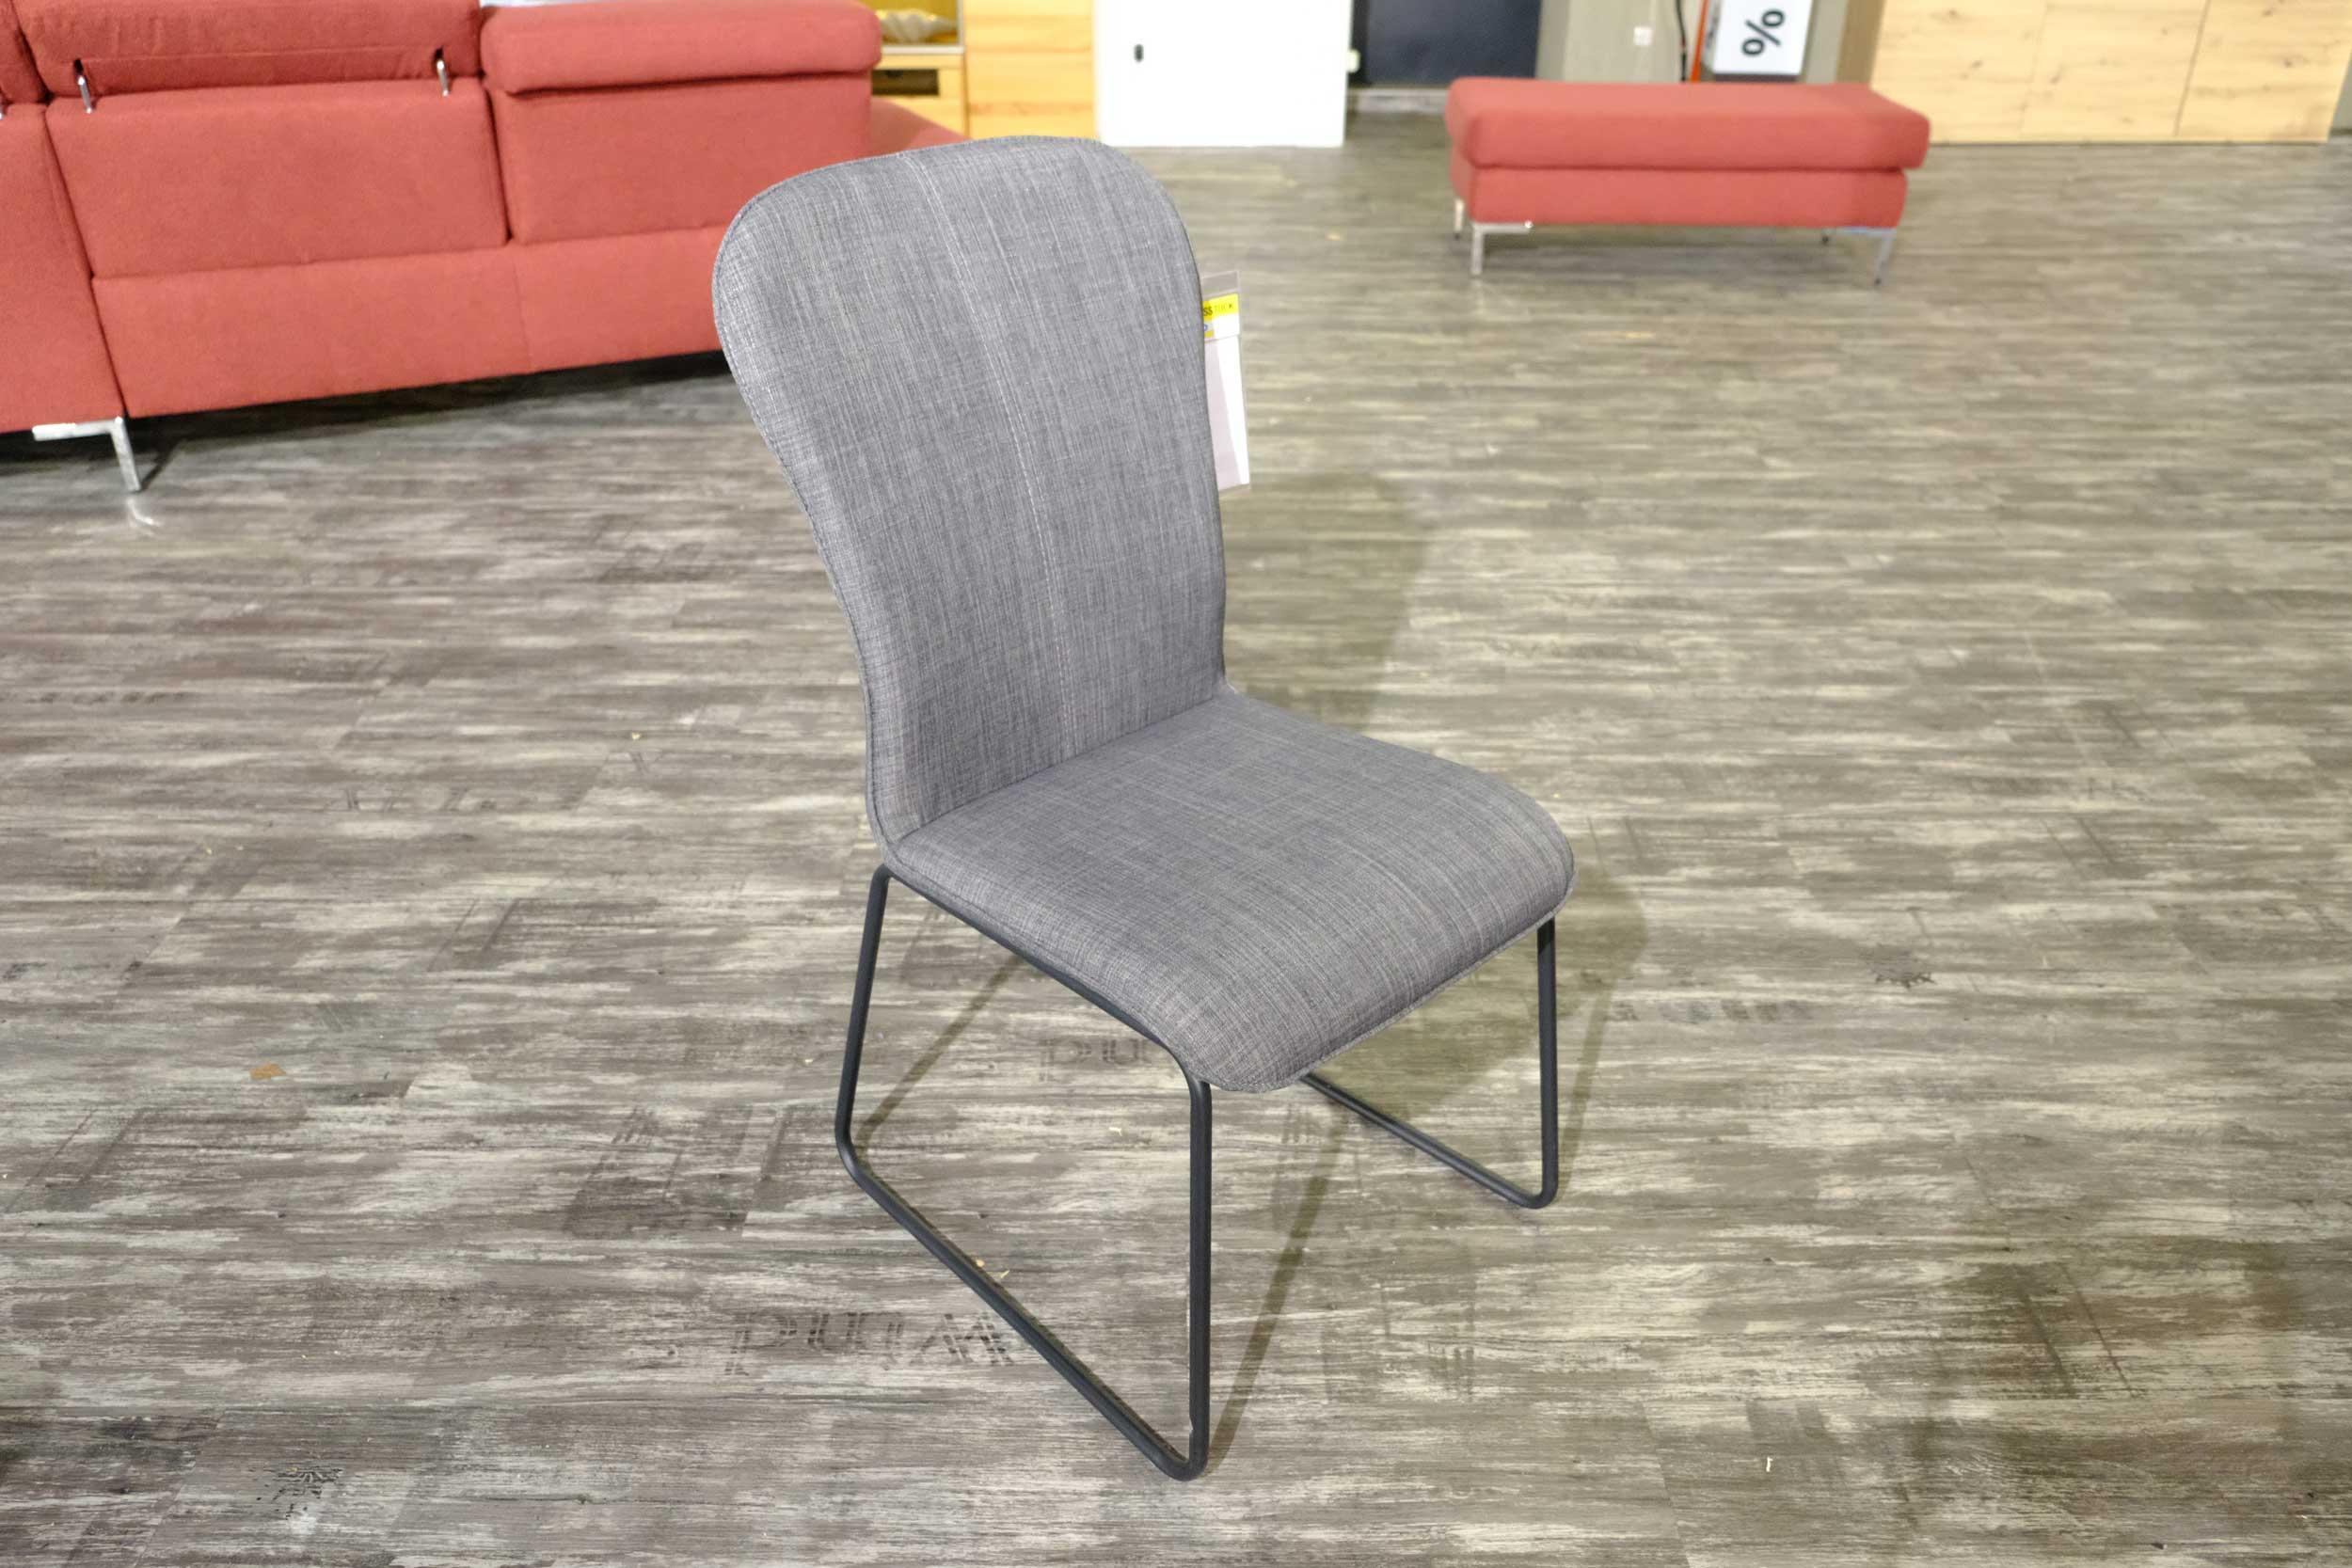 4-Fuß-Stuhl Grau CASADA